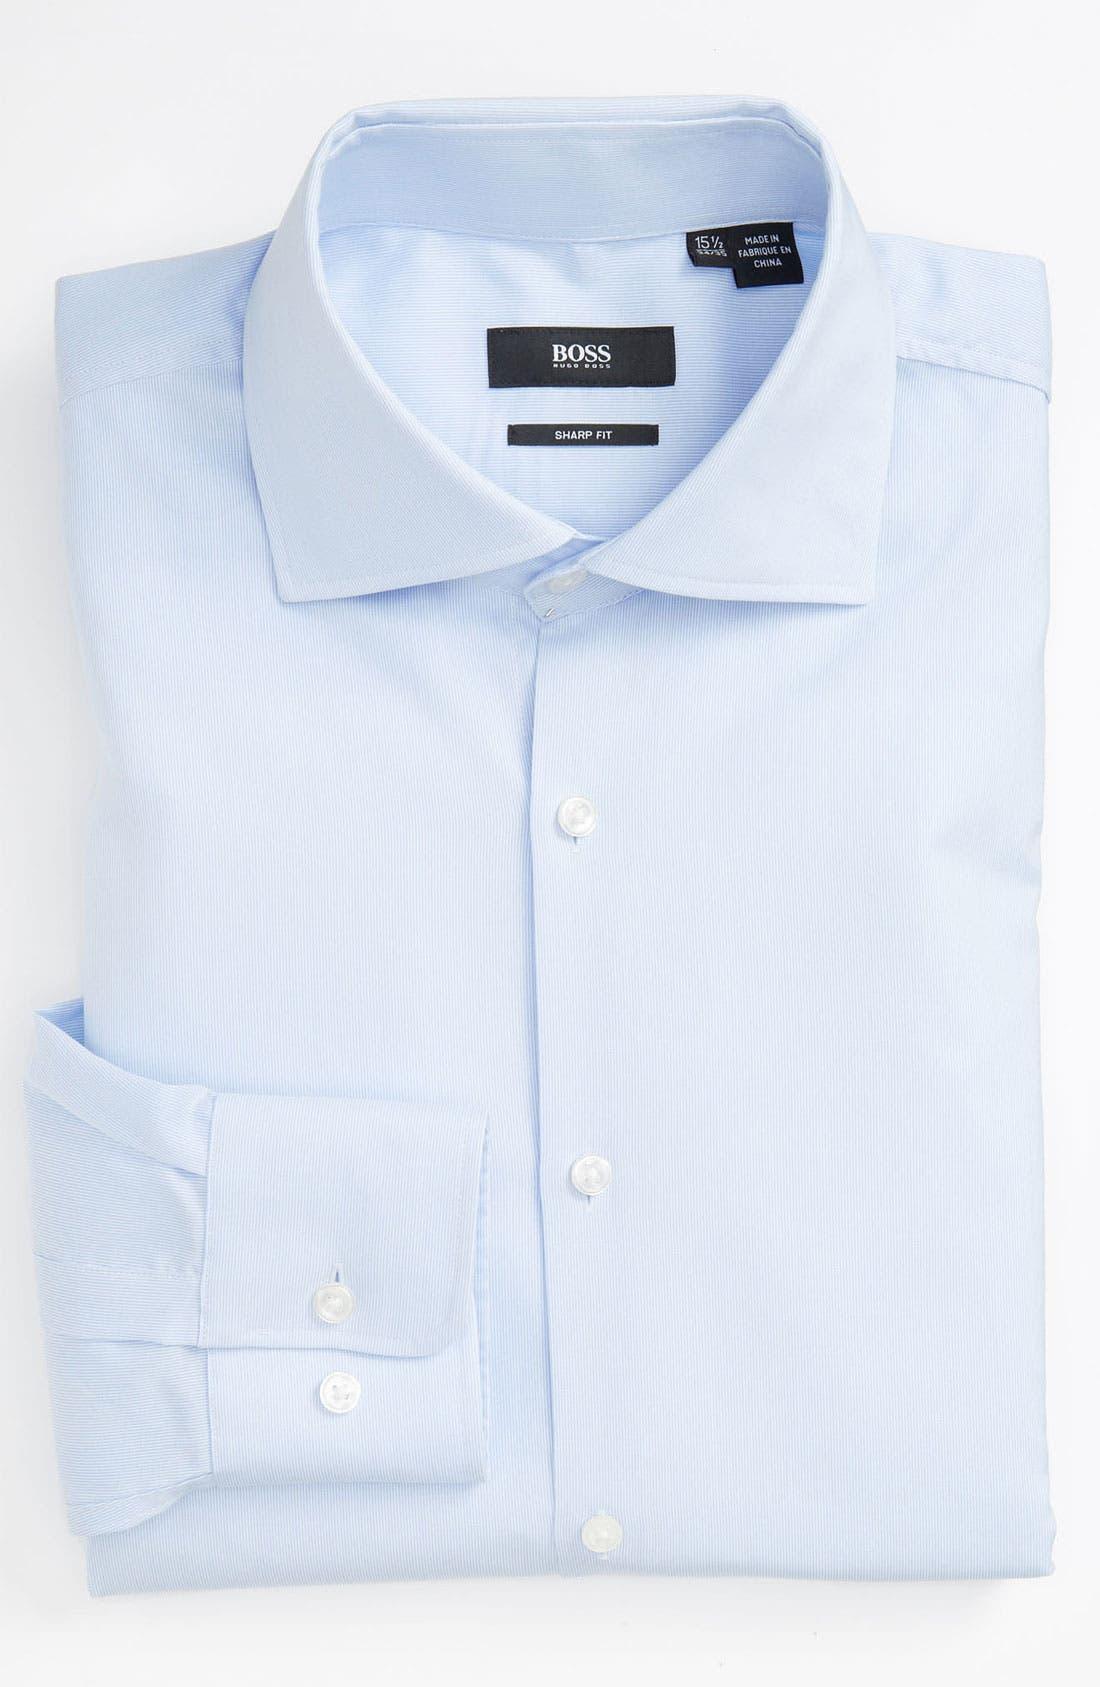 Main Image - Z Zegna Suit & BOSS Dress Shirt